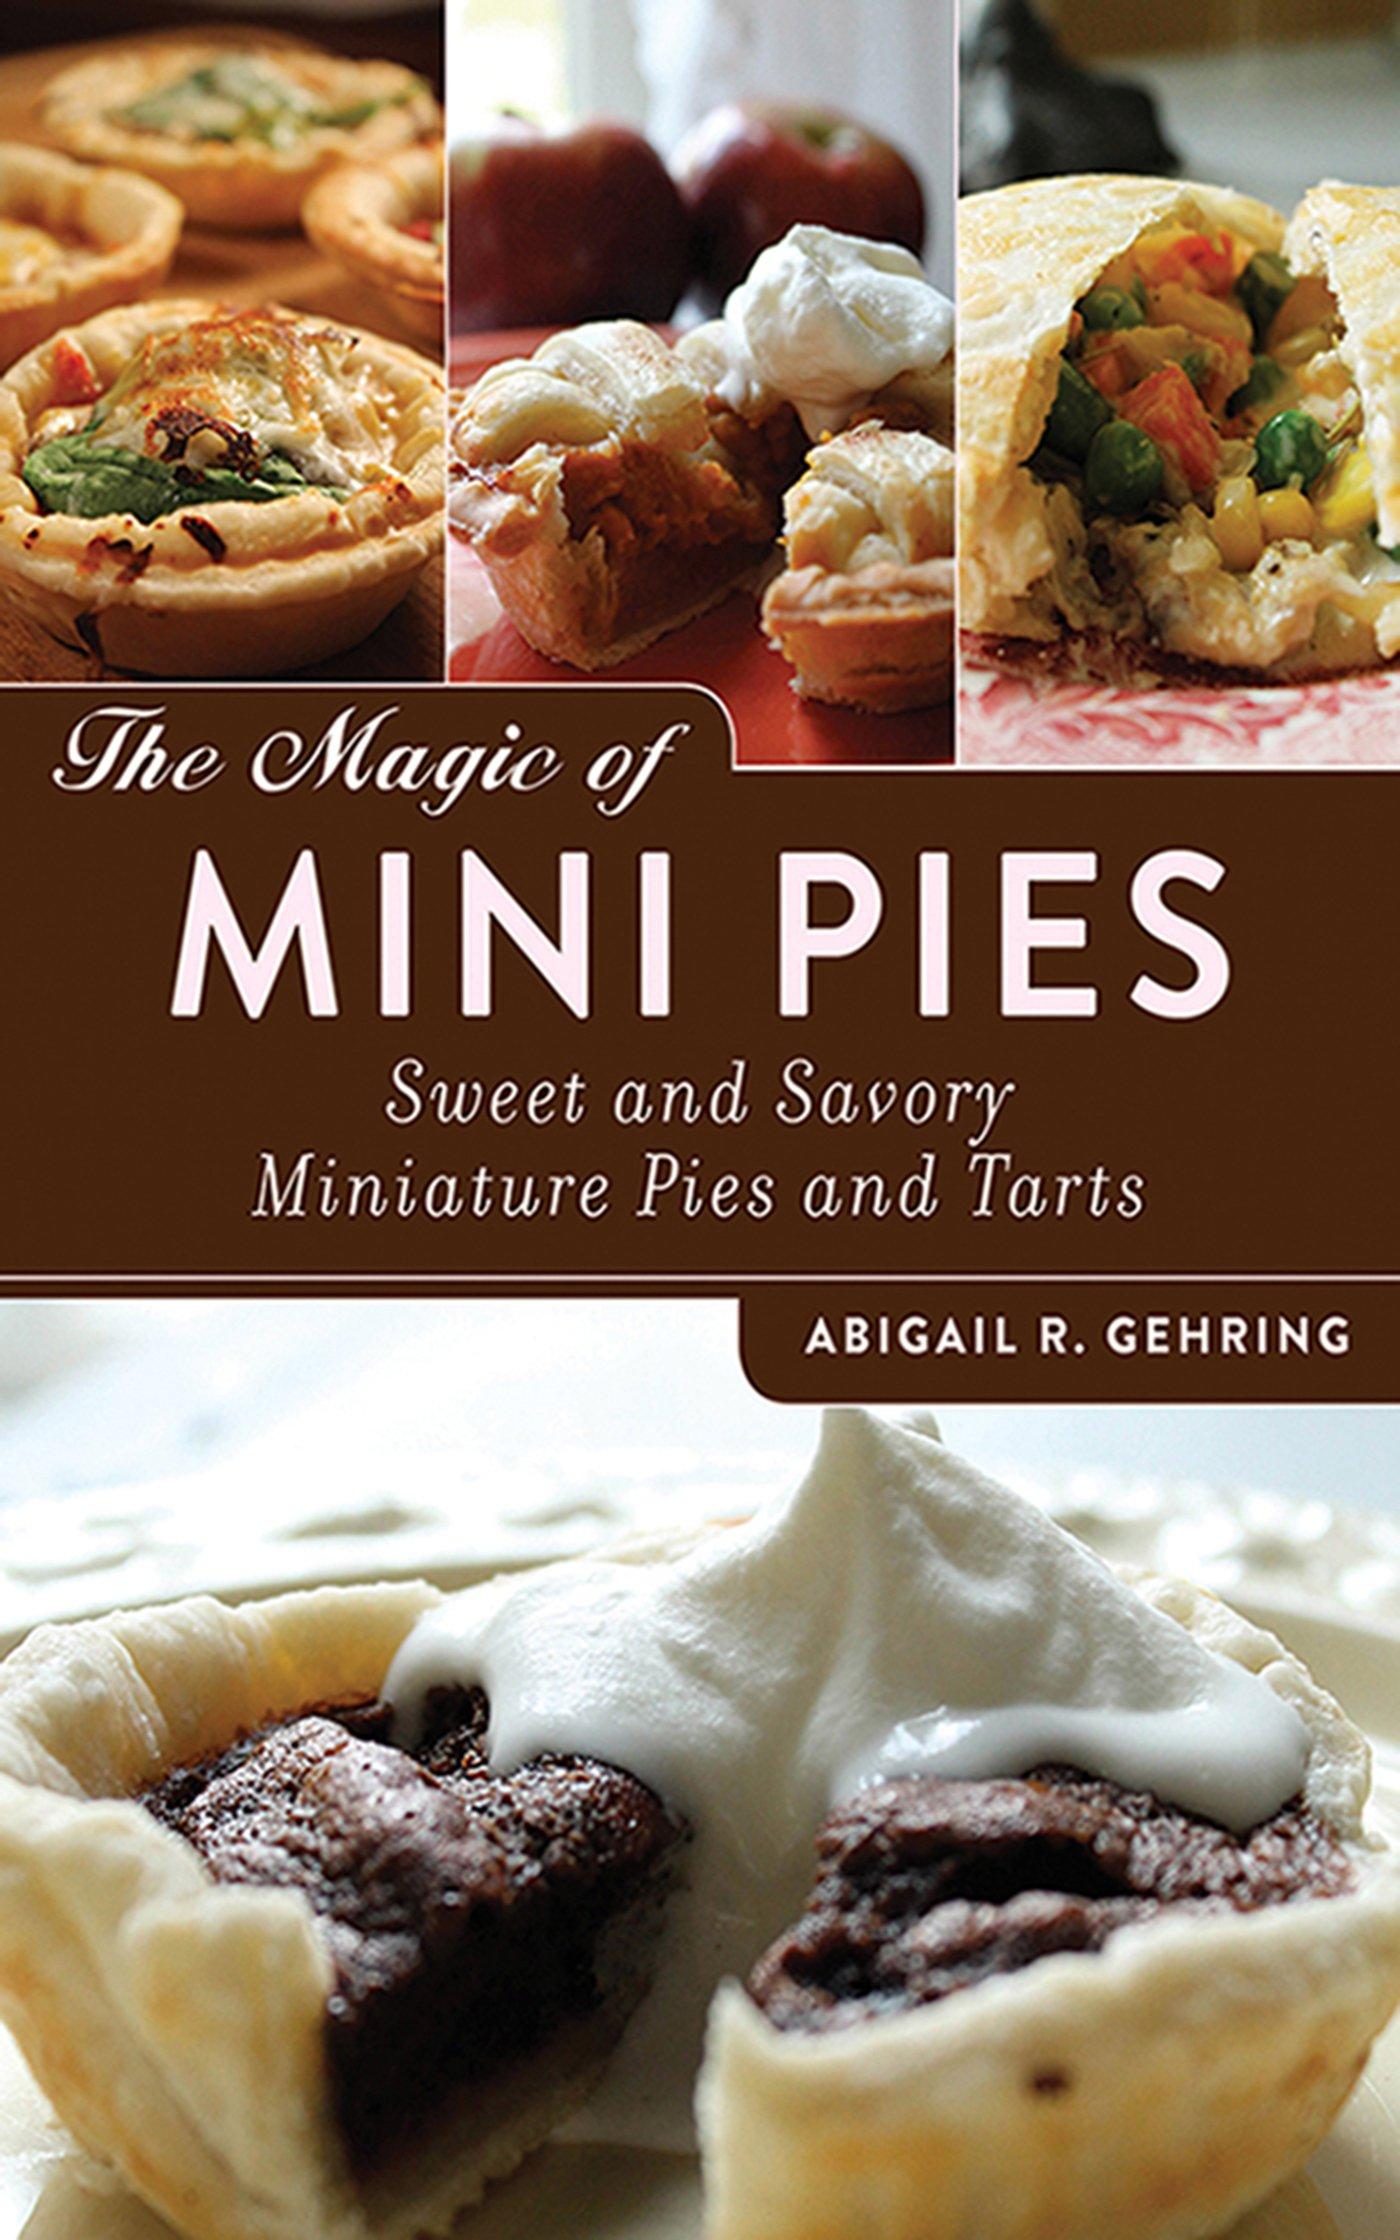 Magic Mini Pies Savory Miniature product image